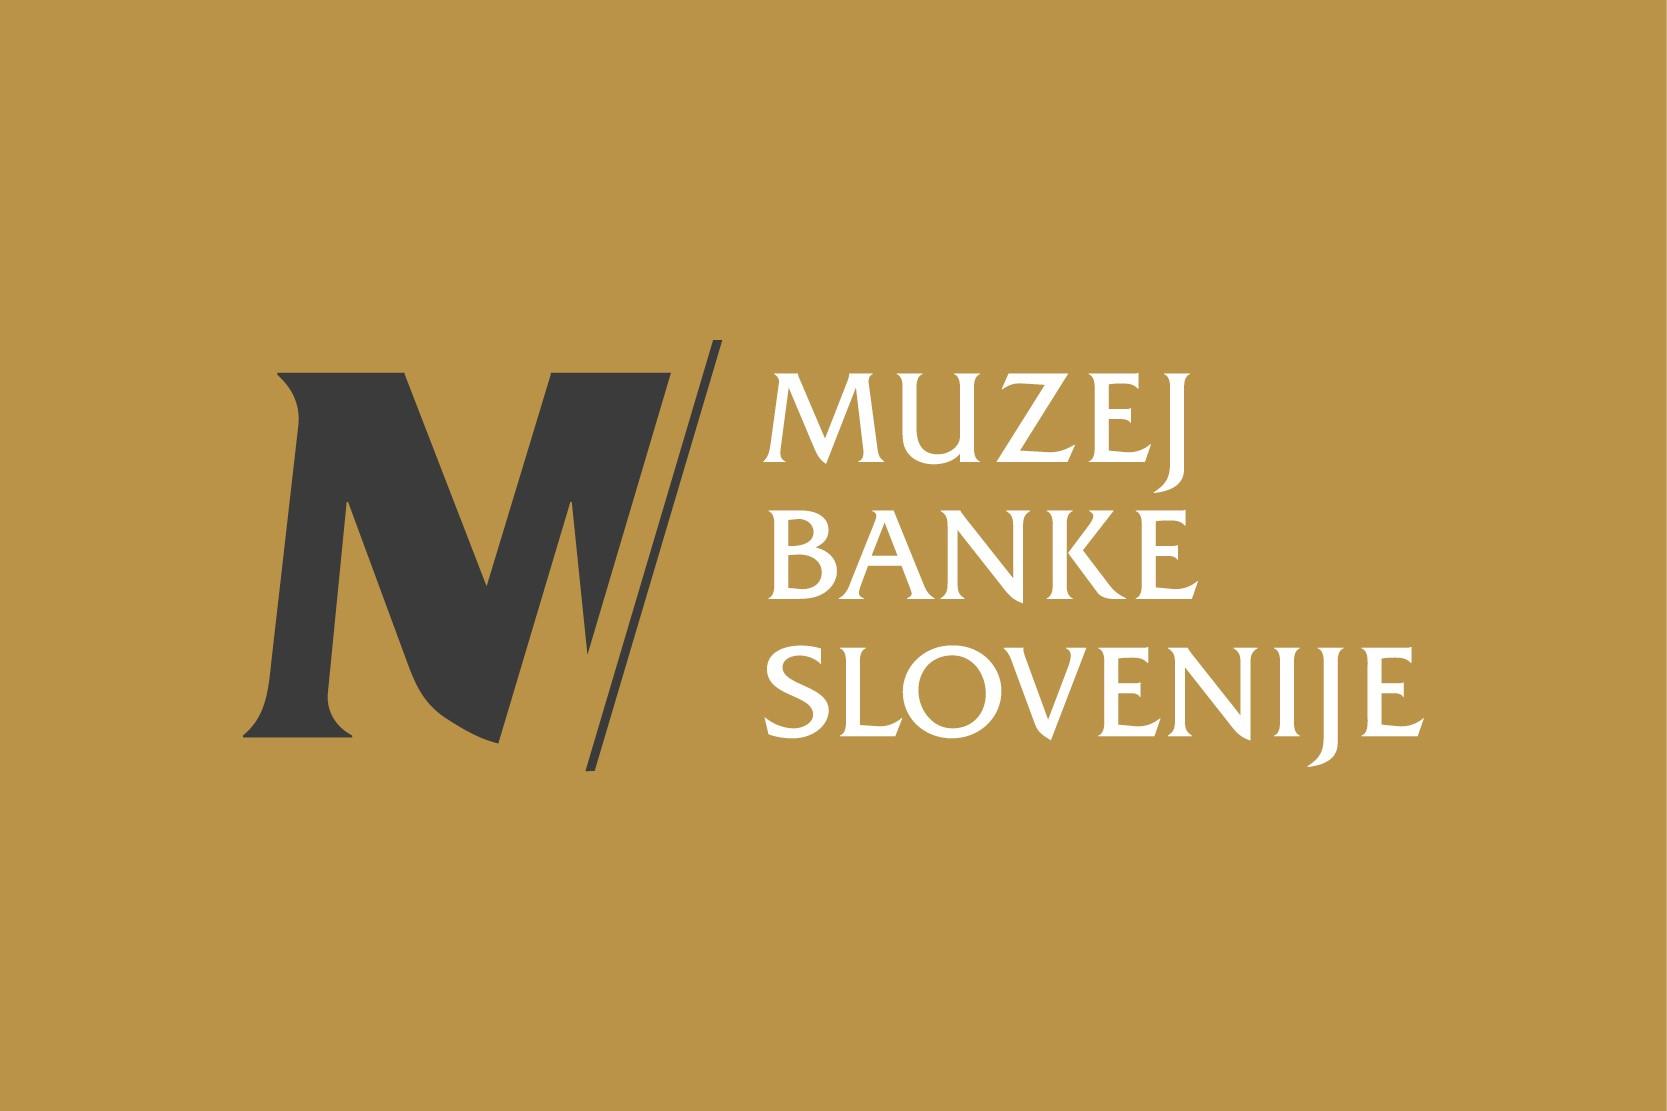 Muzej Banke Slovenije